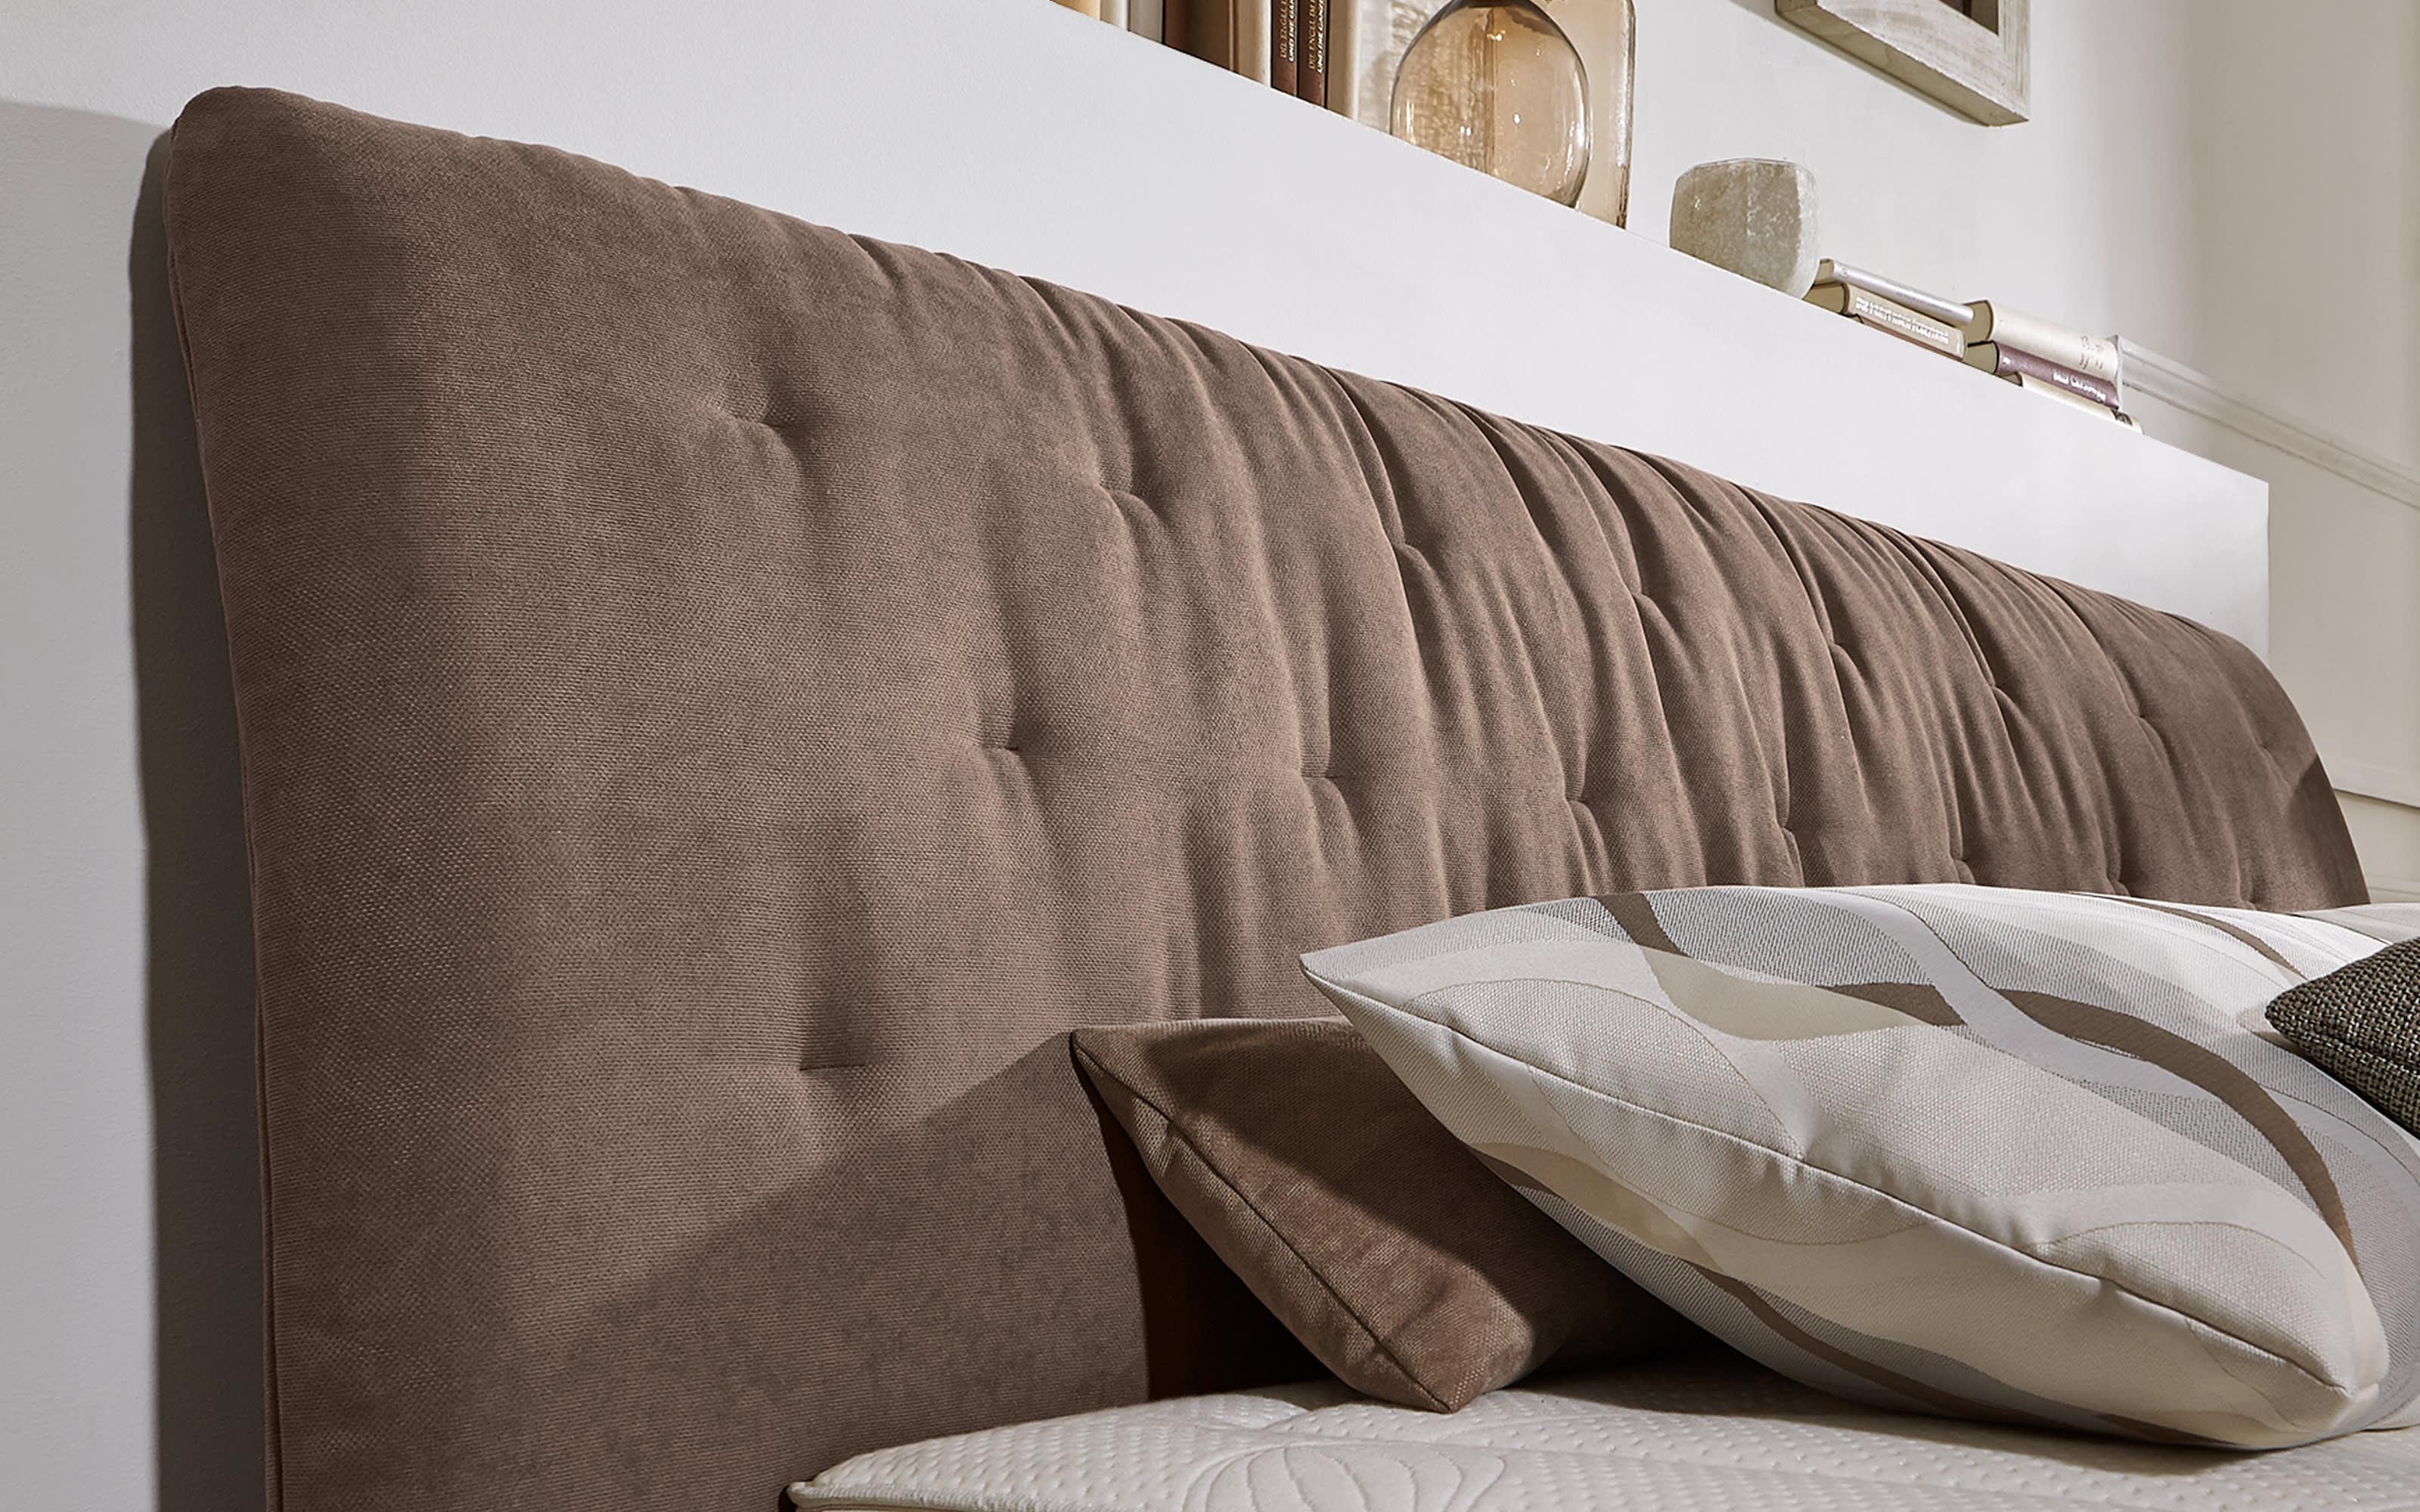 Boxspringbett Prodomo-Comfort in Billie nougart, Liegefläche ca. 180 x 200 cm, Matratzen Härtegrad 2 und Härtegrad 3